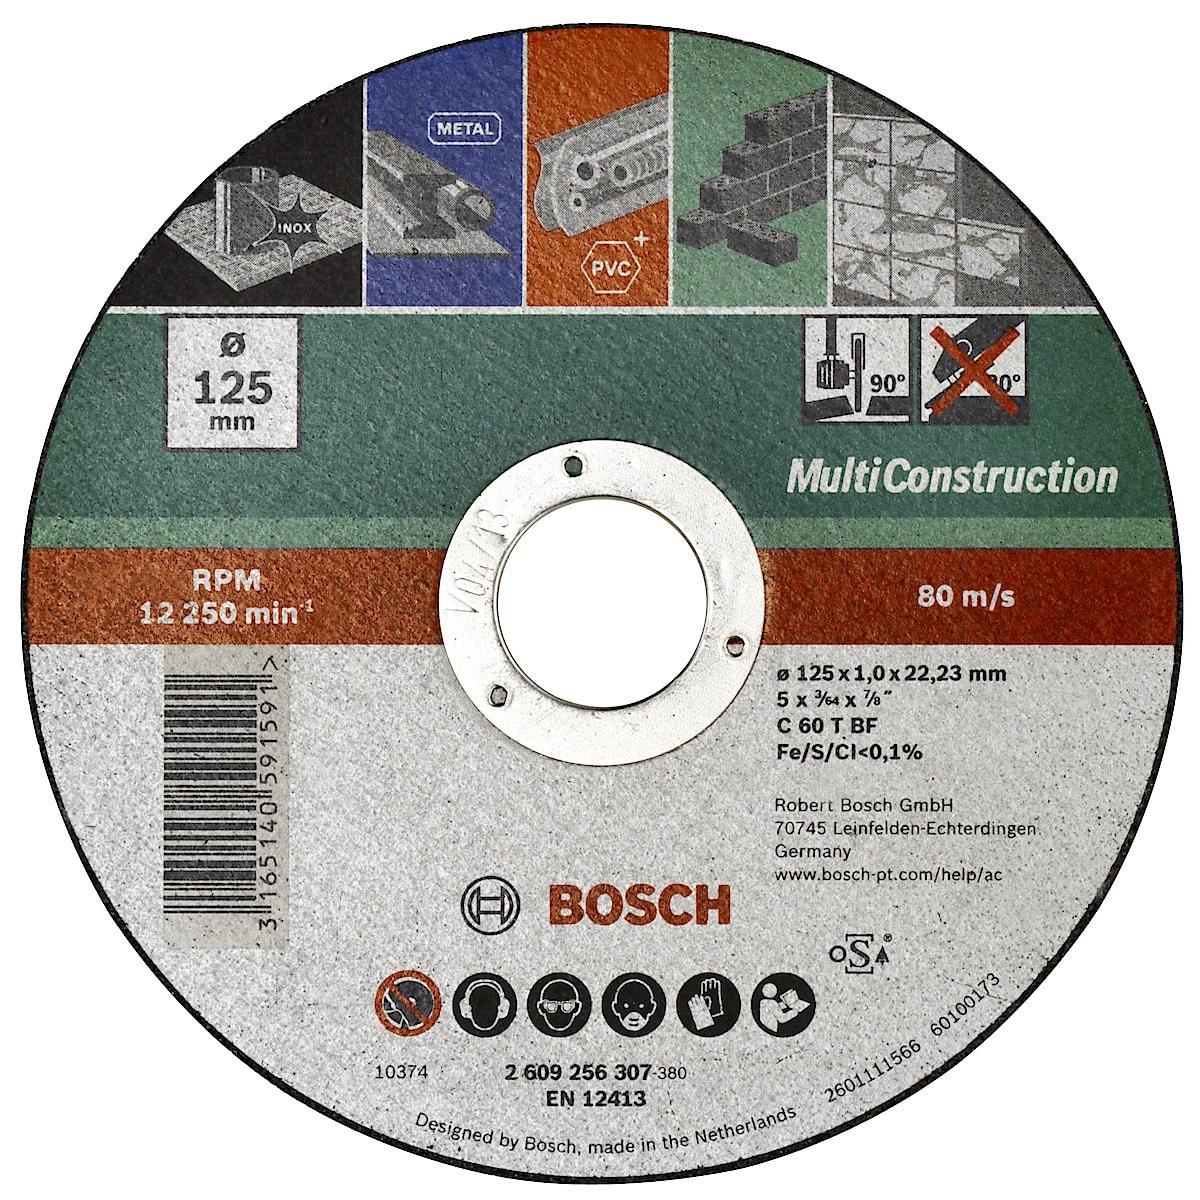 Kapskiva universal 125 mm, Bosch